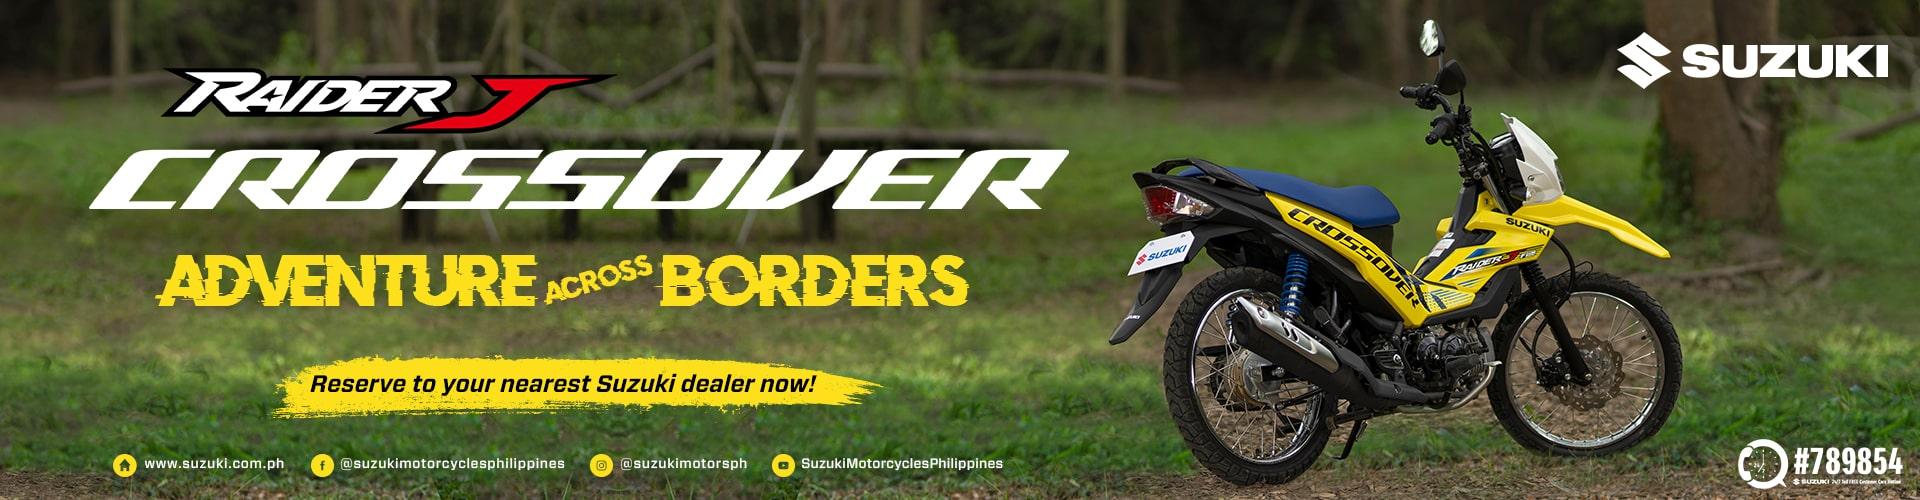 Raider J Crossover ปี 2020